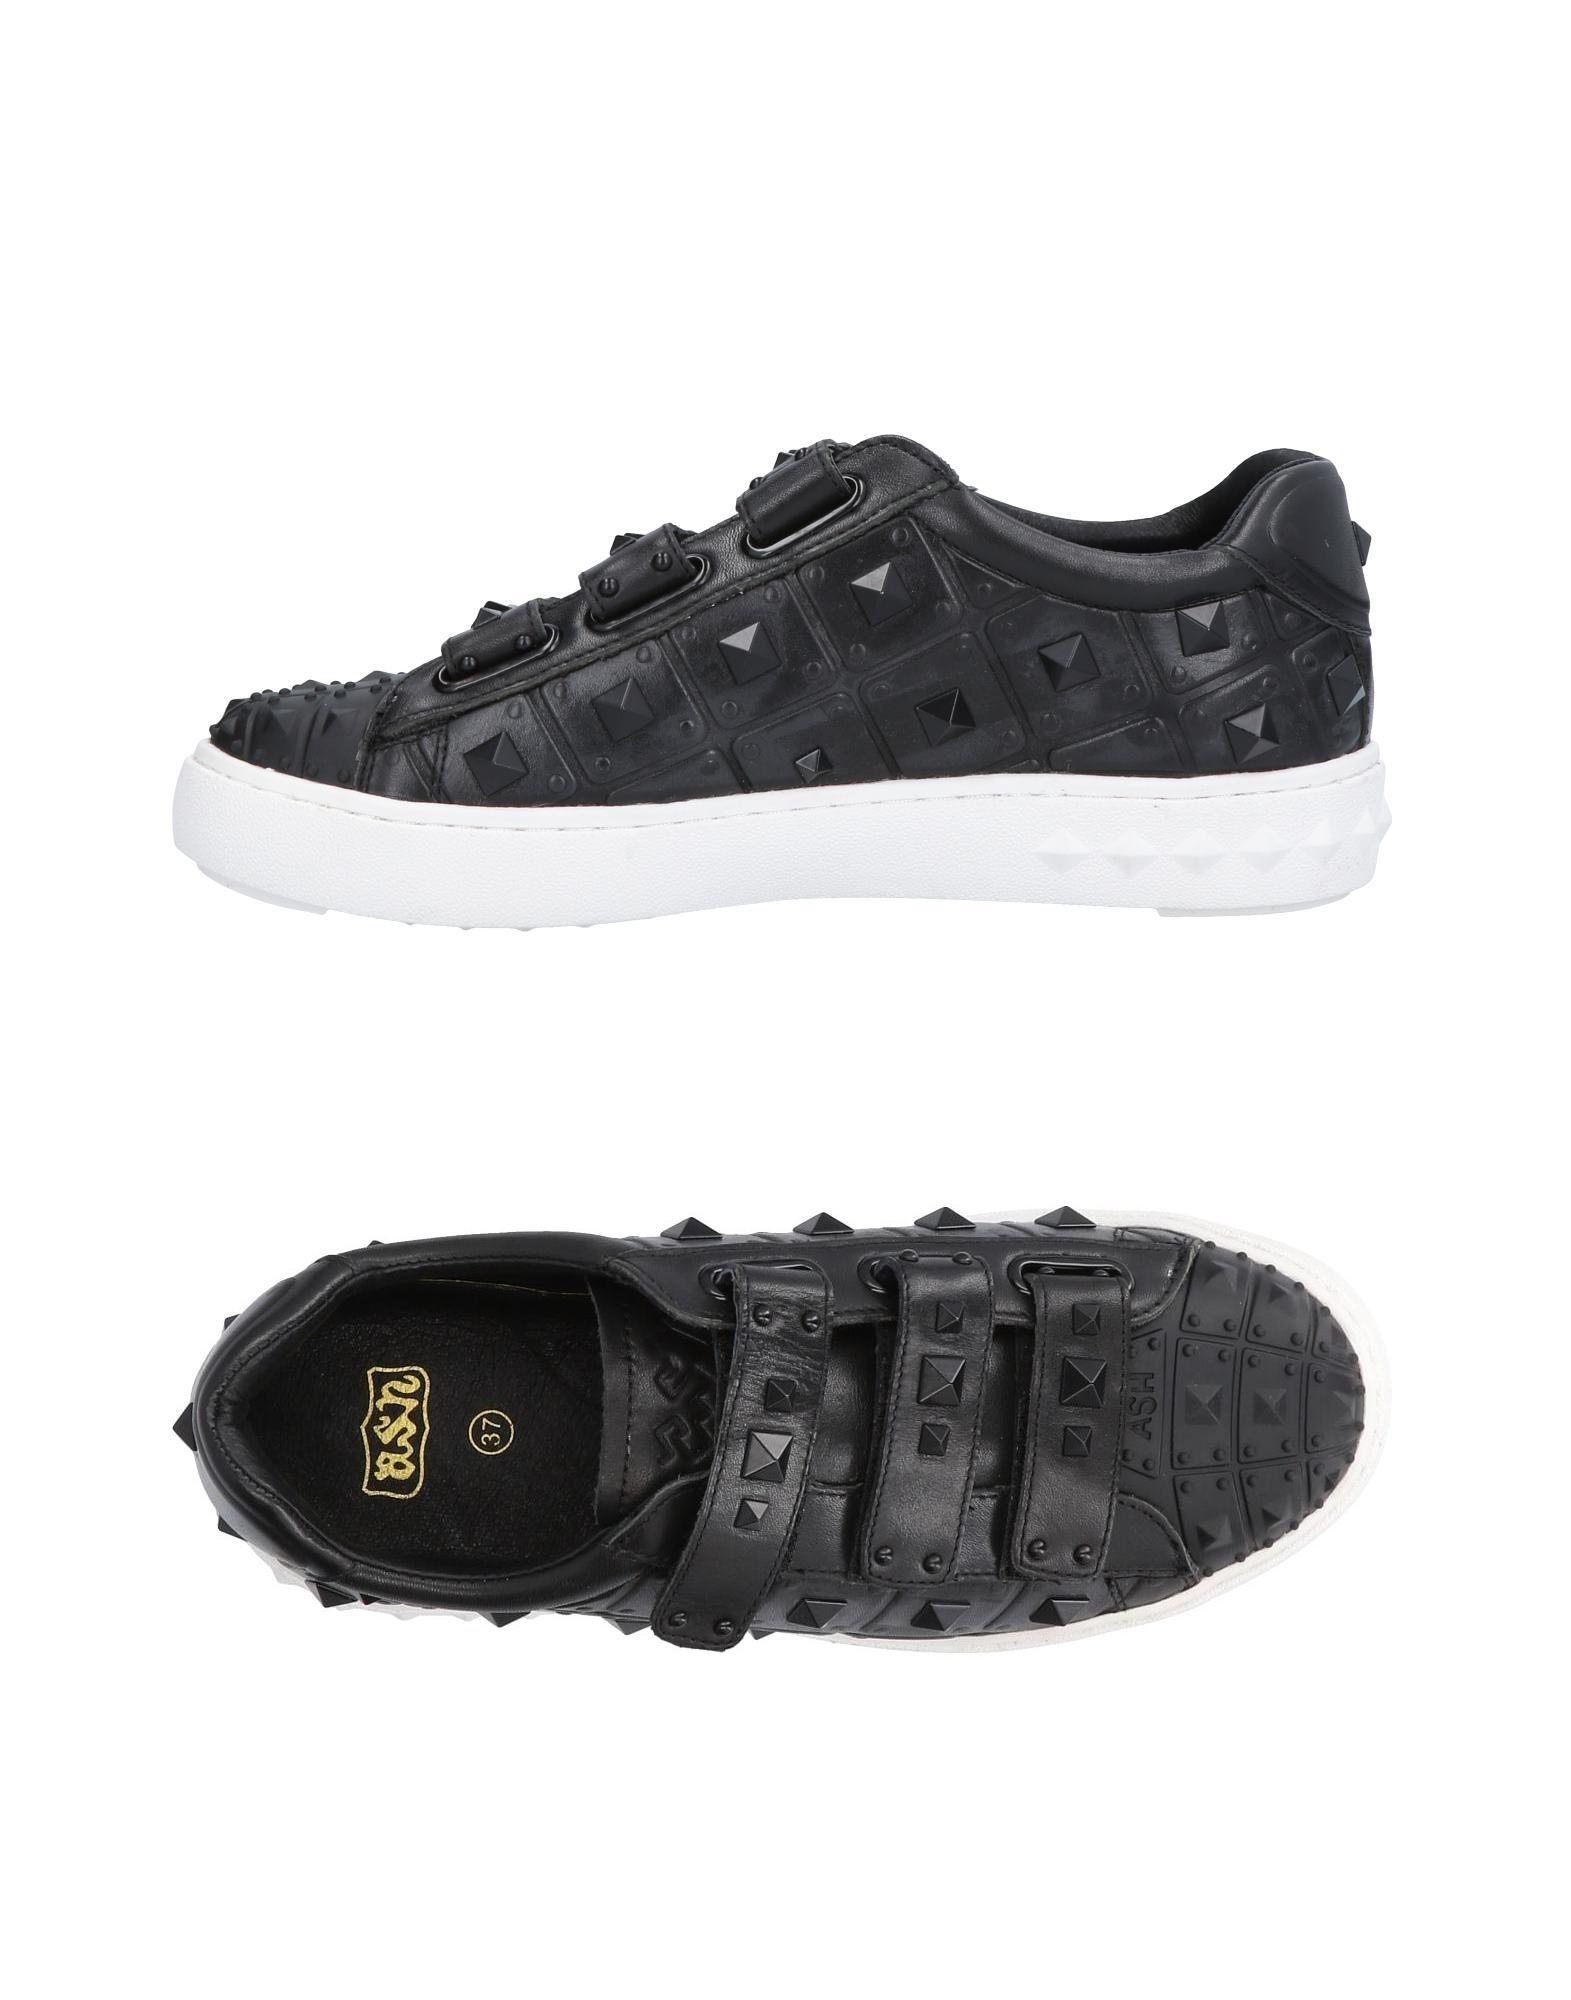 Zapatos de mujer baratos zapatos de mujer Mujer Zapatillas Ash Mujer mujer - Zapatillas Ash  Negro 8a1185